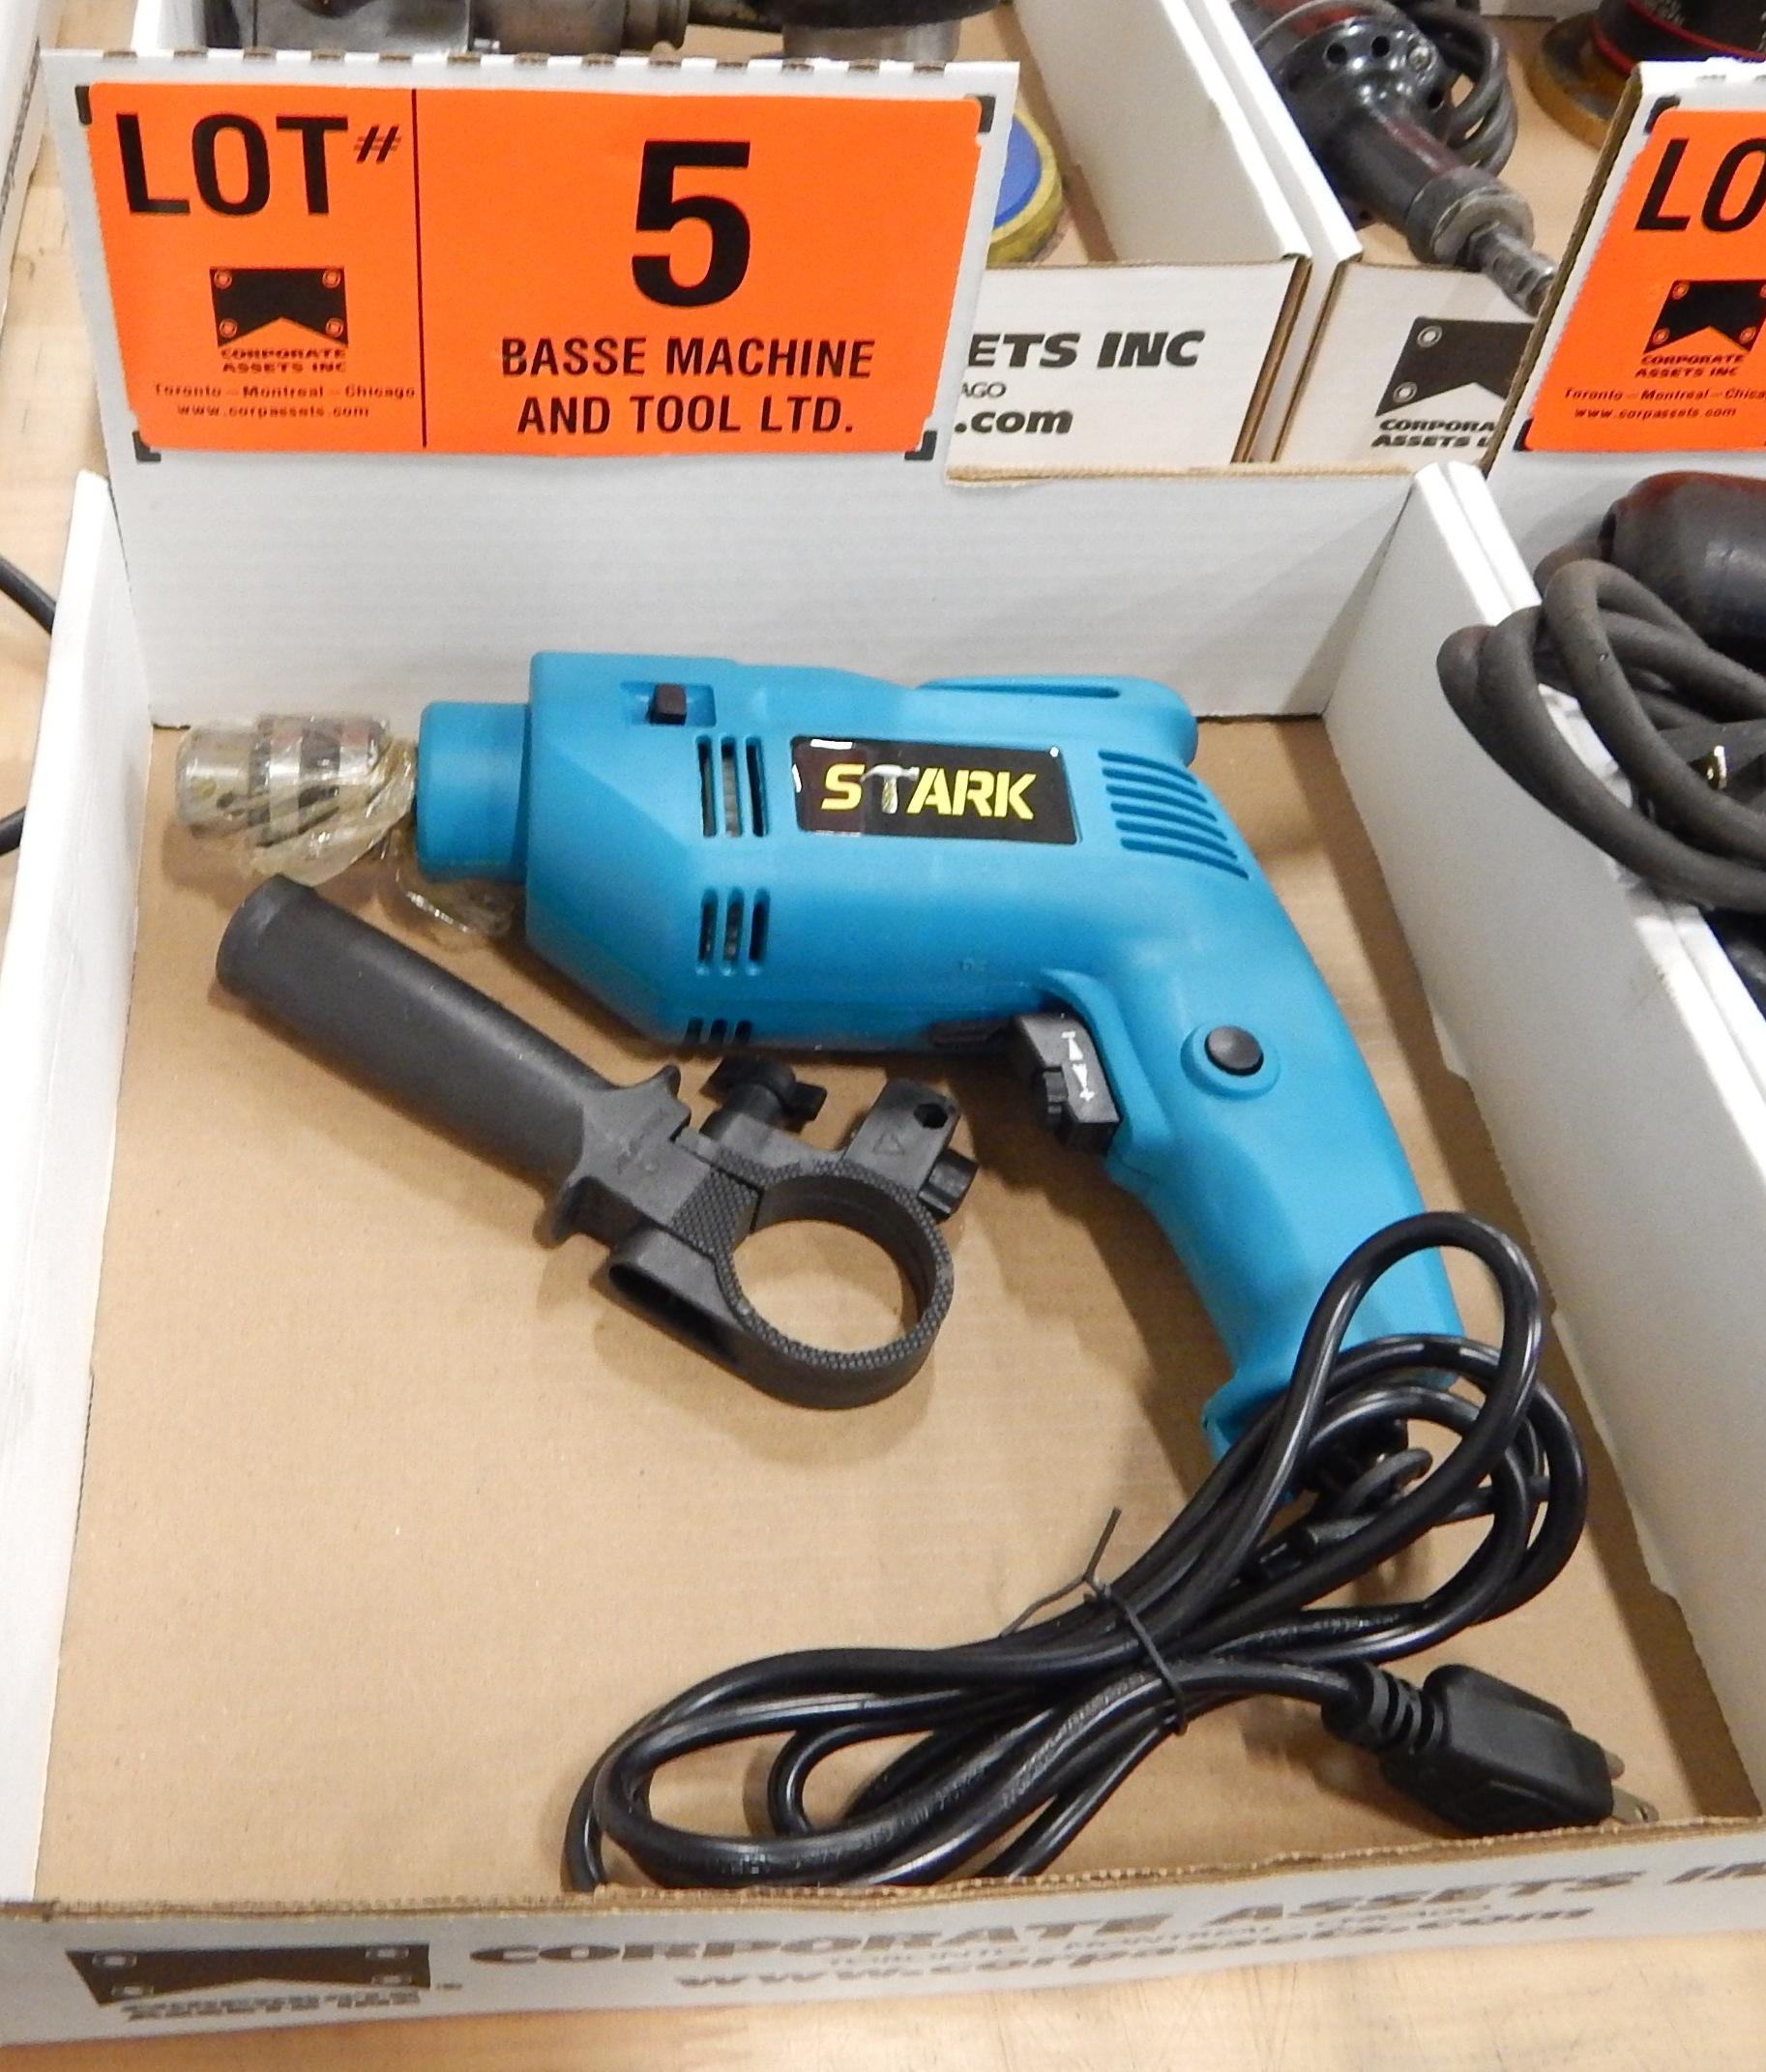 Lot 5 - STARK ELECTRIC DRILL